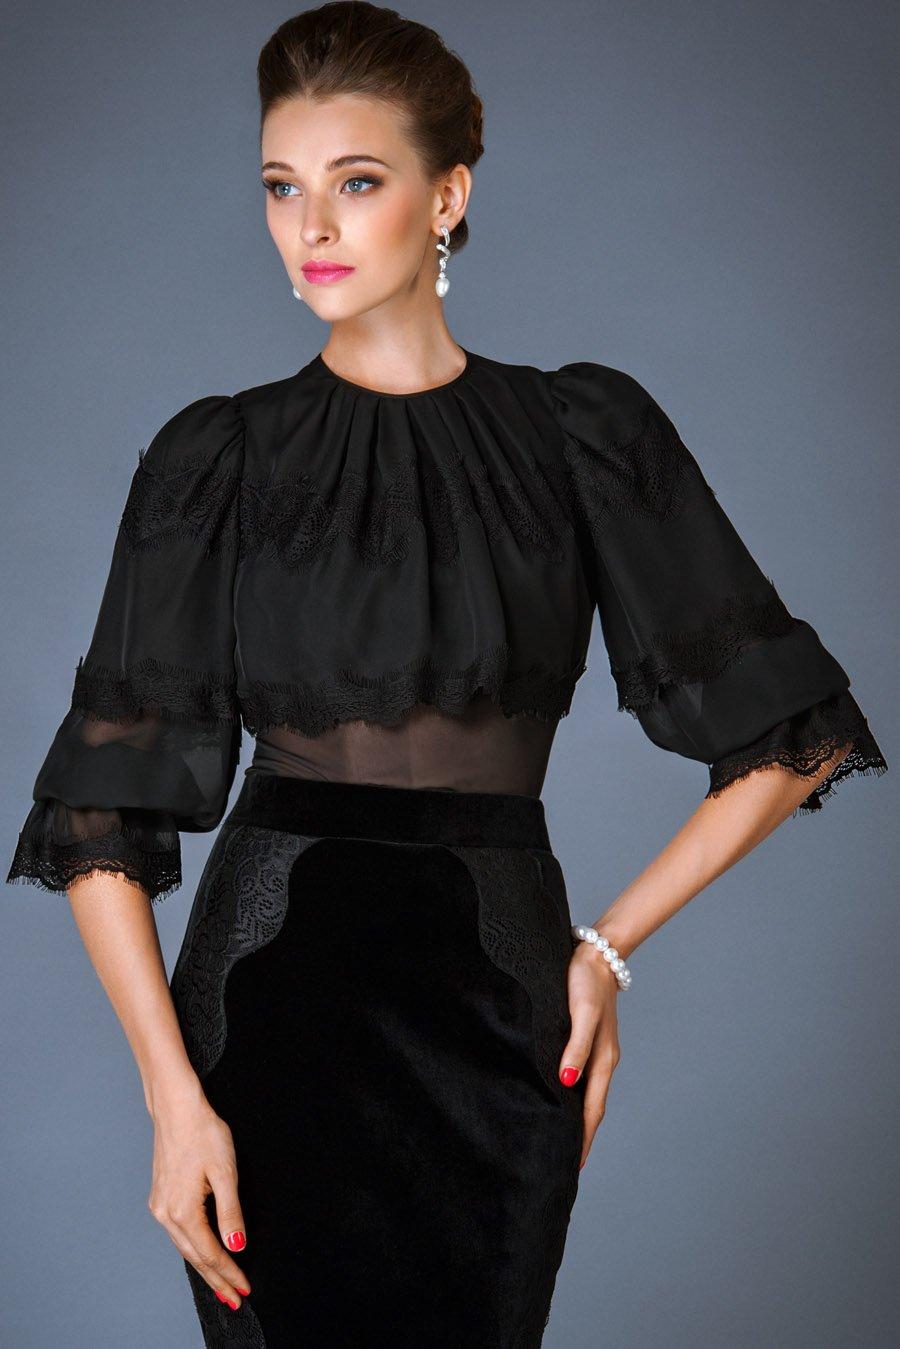 c9b678c95a4 Zeusycipdexon — Женская одежда нарядные блузки